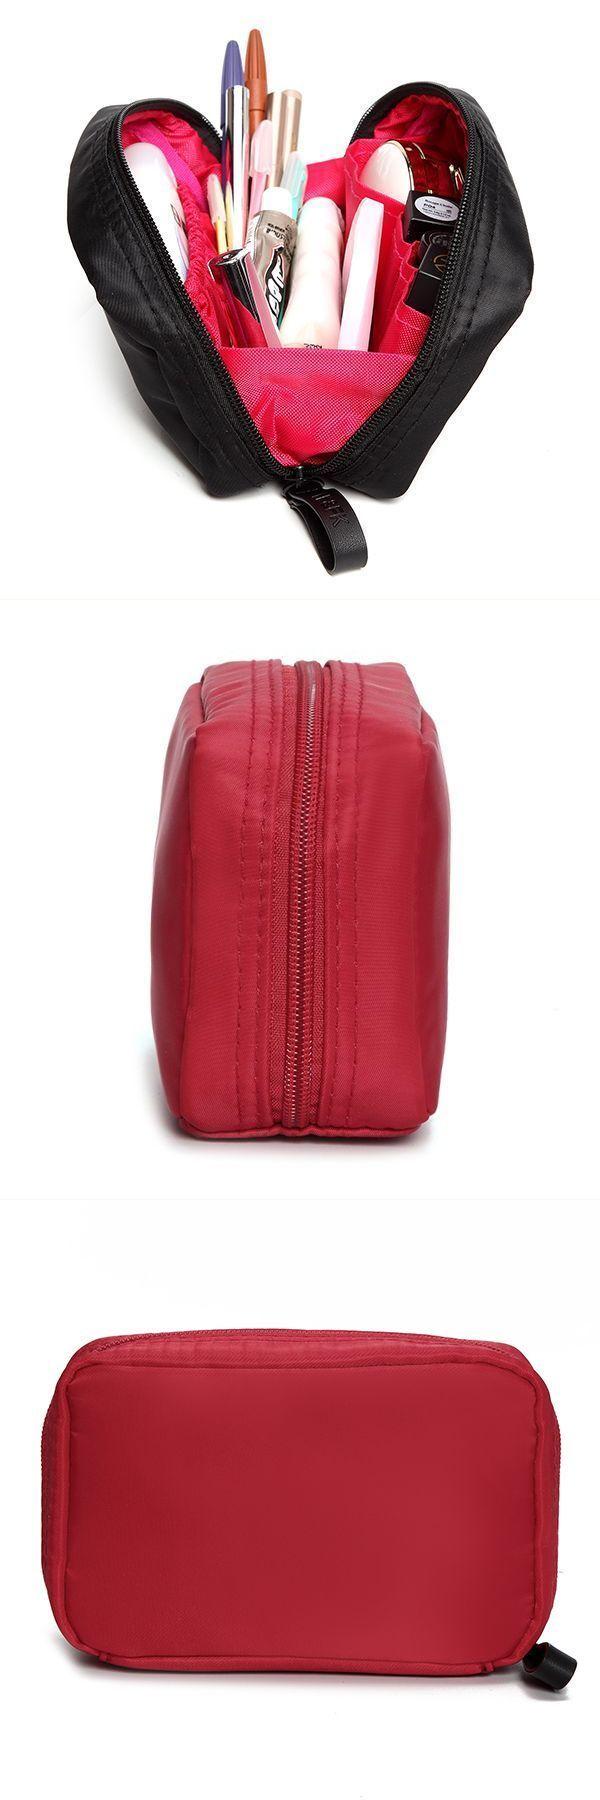 Women Nylon Cosmetic Bag Outdoor Portable Little Travel Storage J Crew Clutch Bags